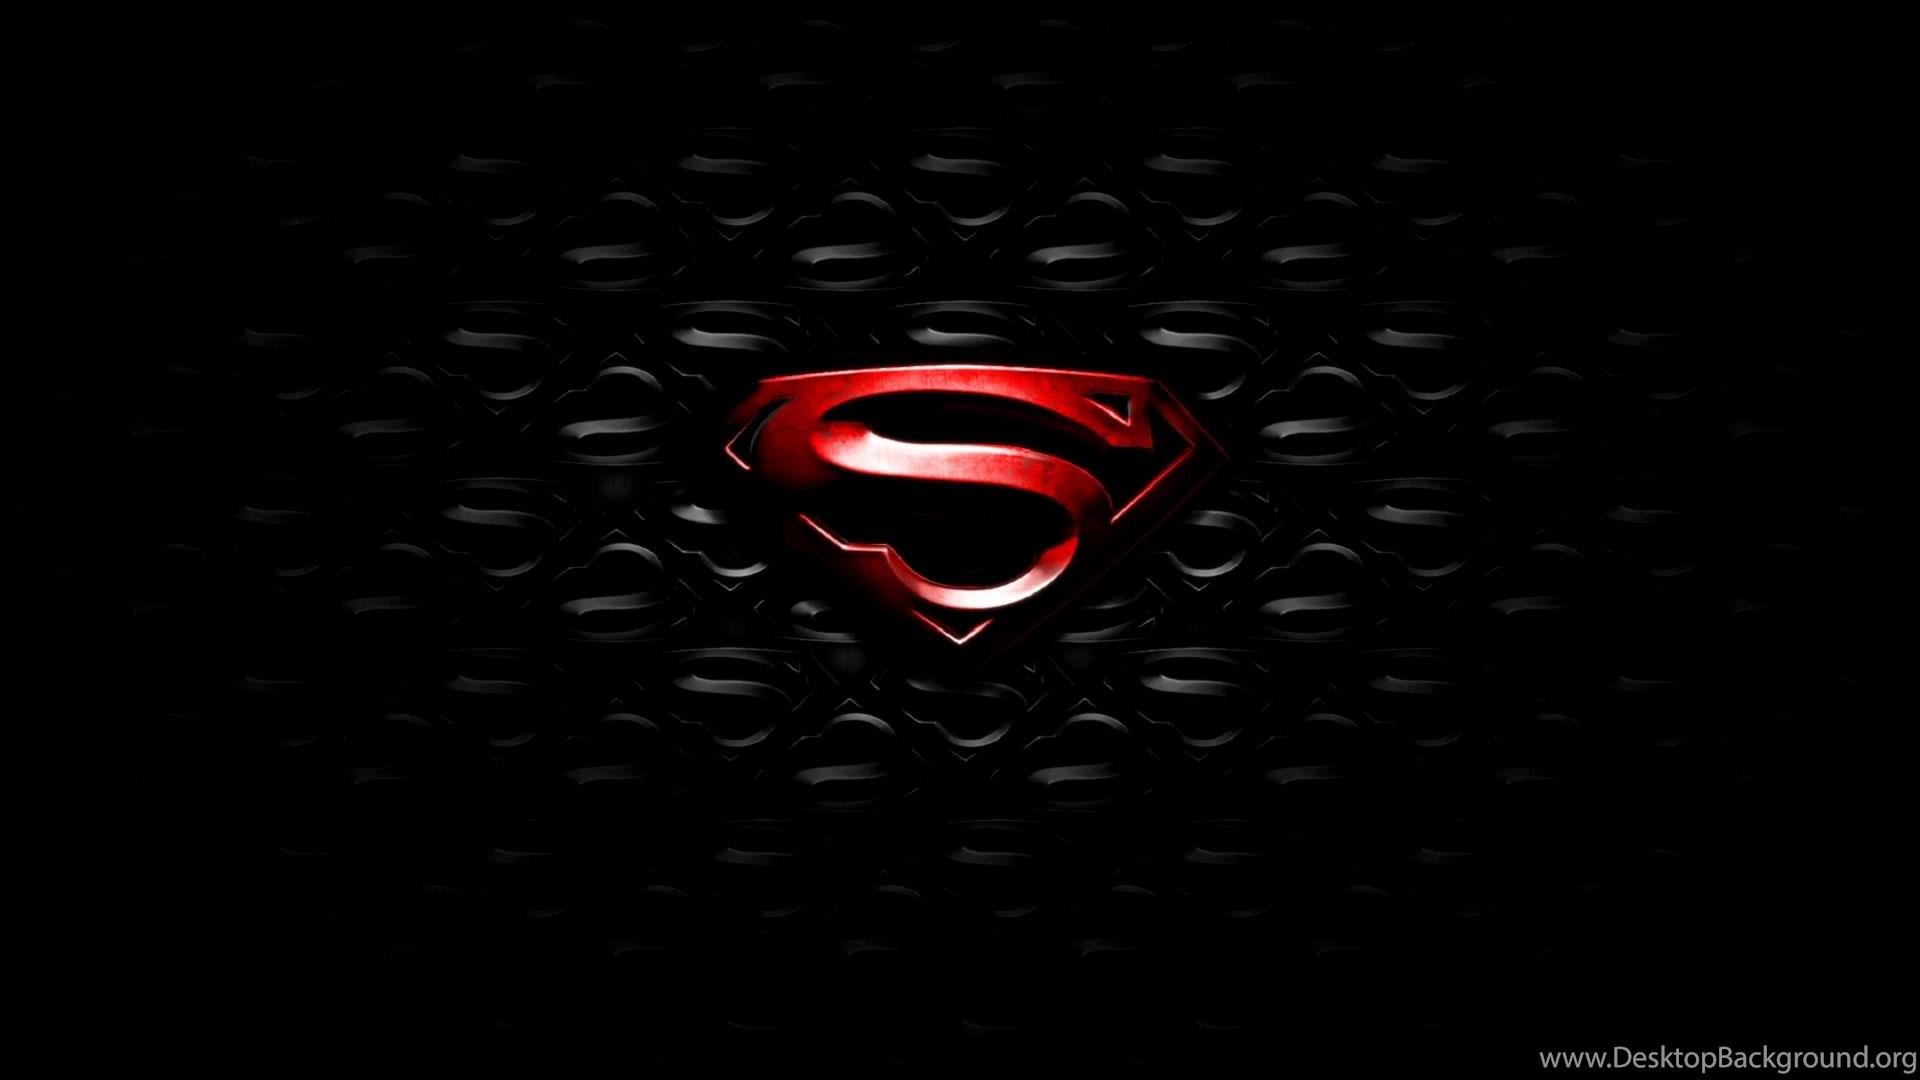 Wallpapers superman logo black wallpapers hd desktop picture desktop popular voltagebd Gallery